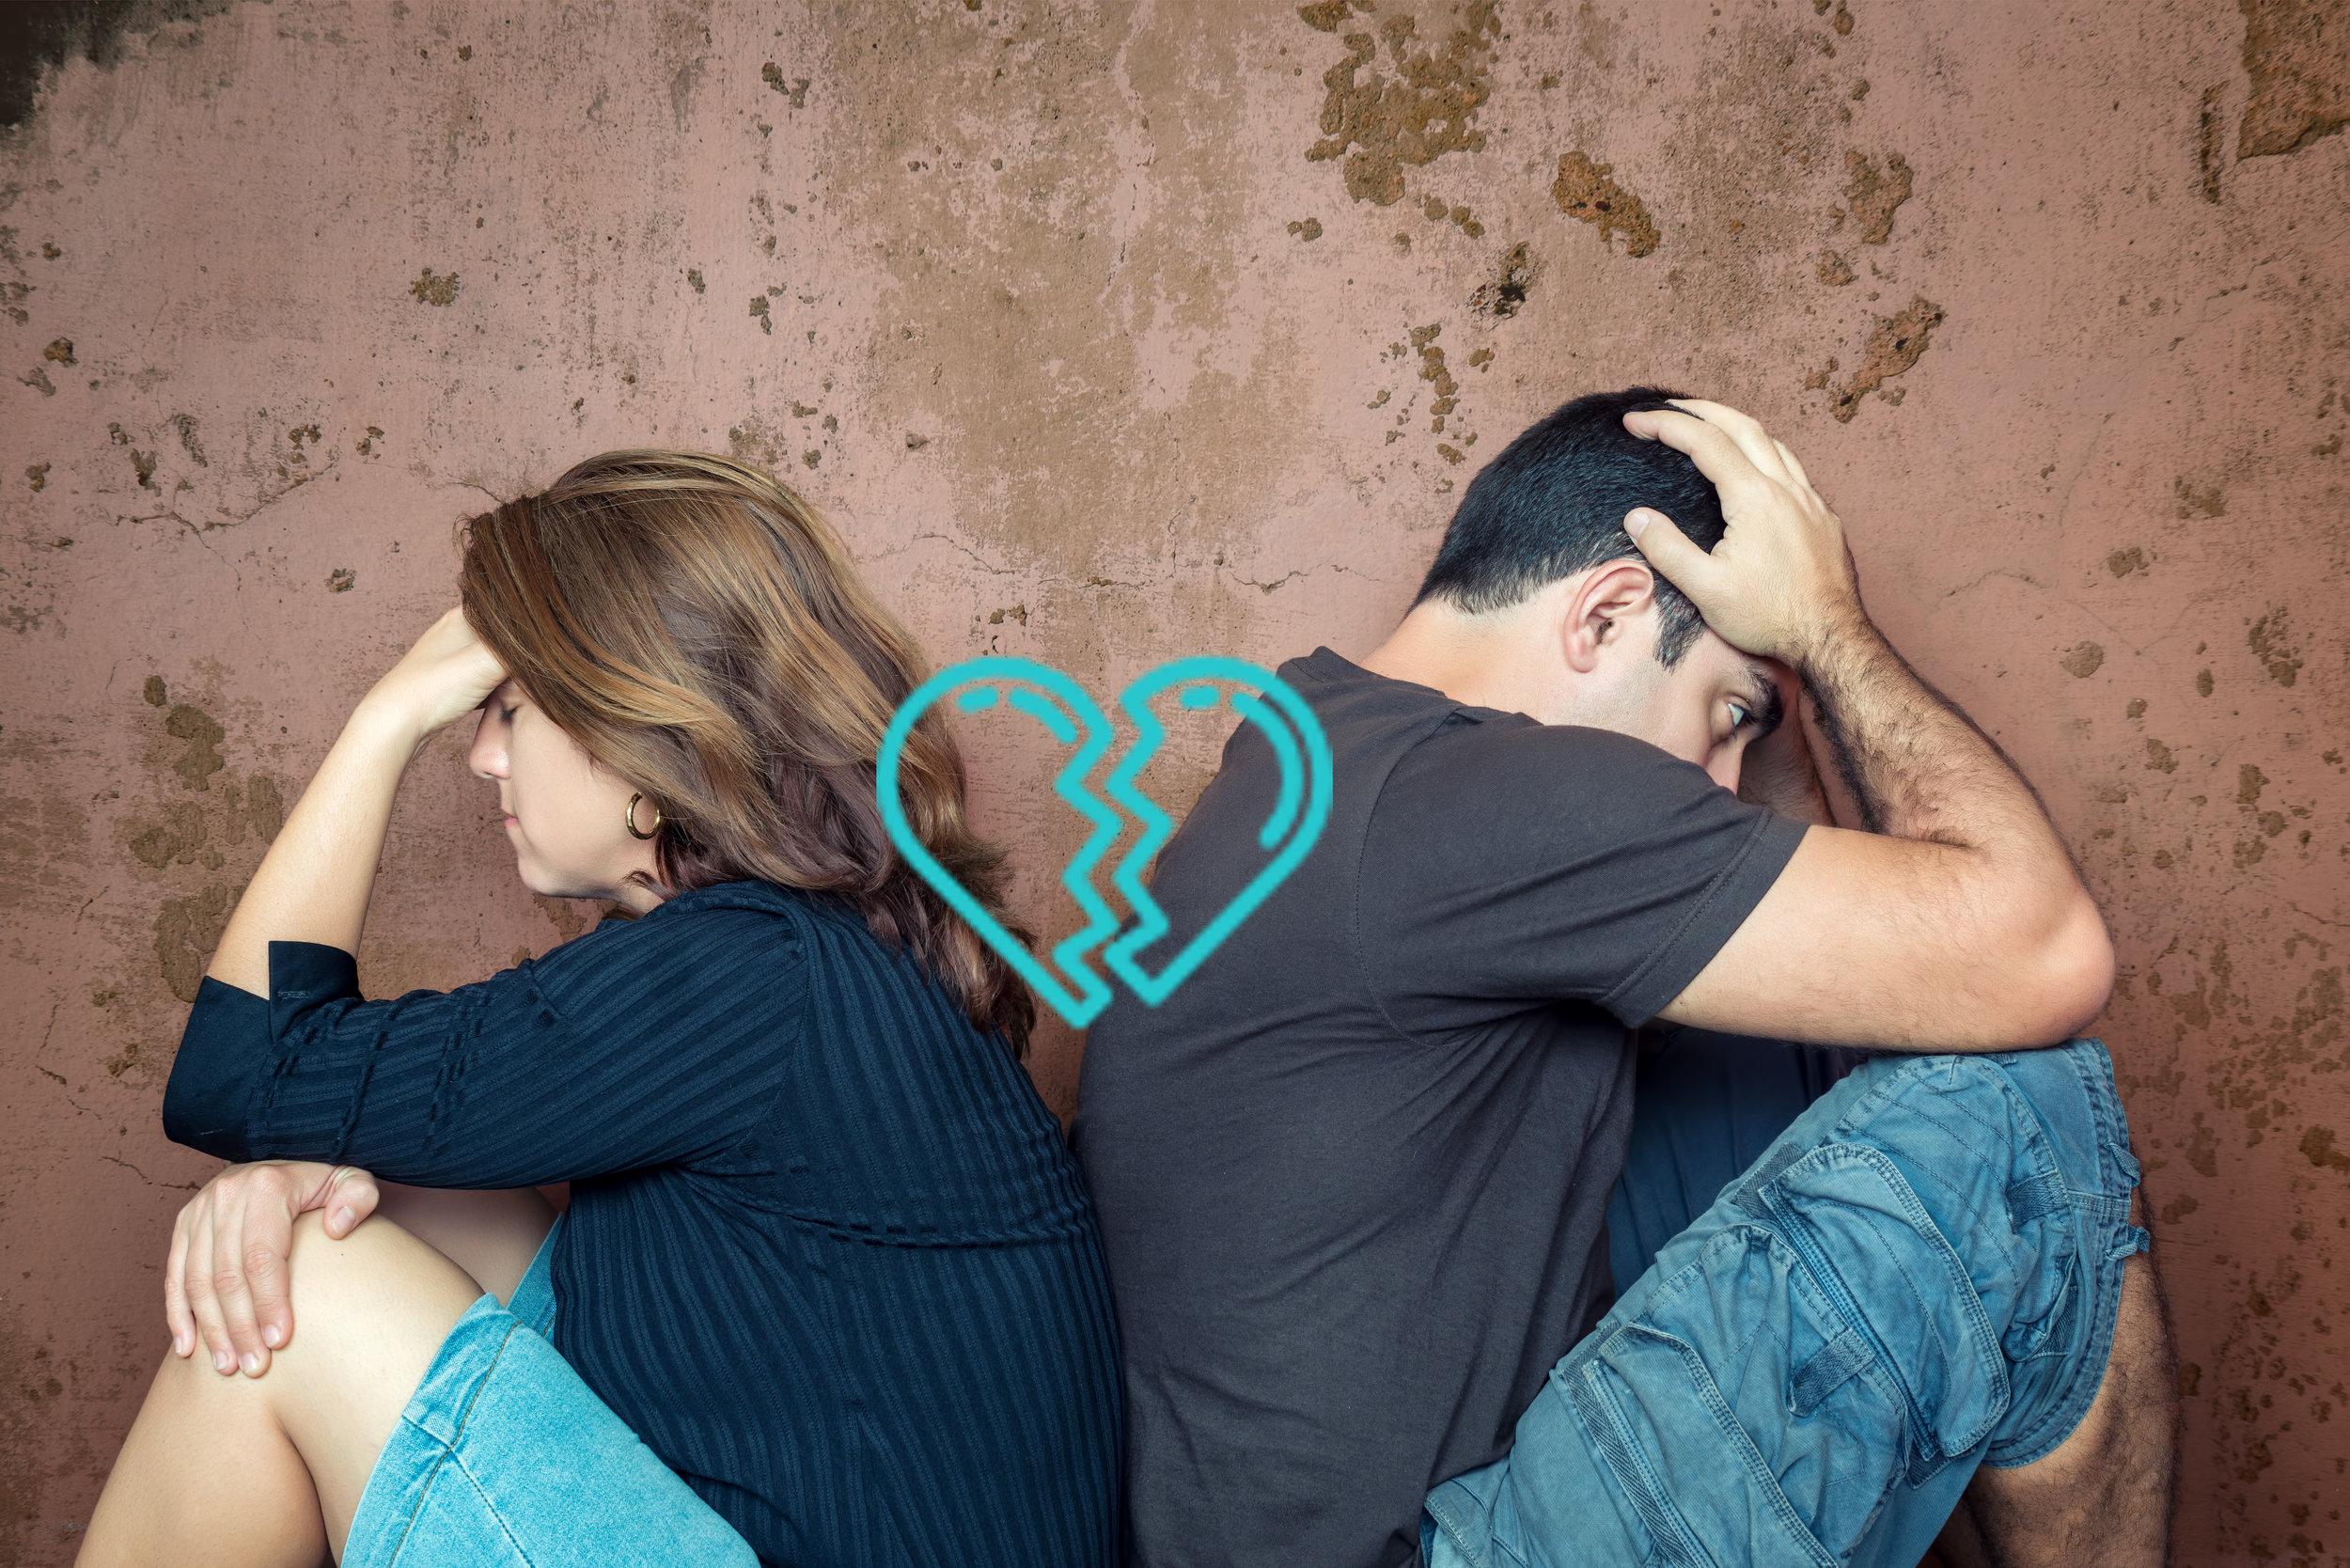 Transition-Life-Wellness-Postpartum-Separation-Divorce Councelling